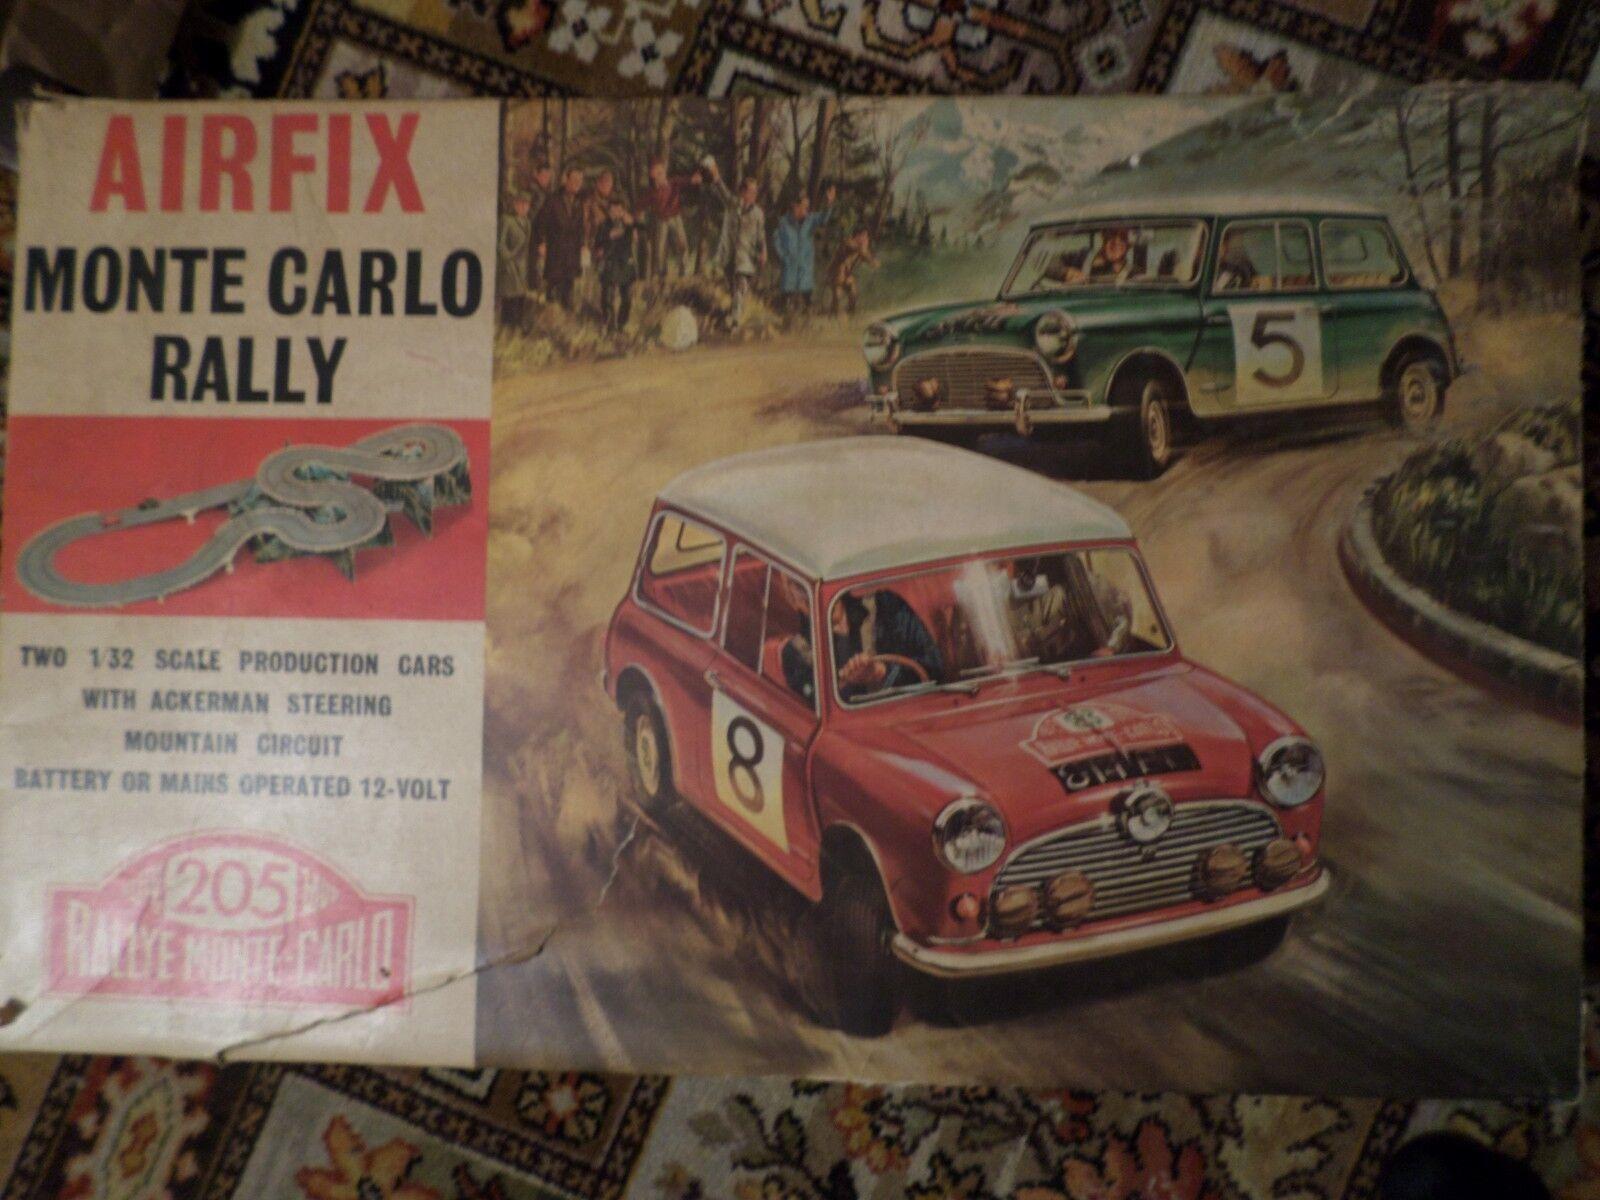 Airfix Mini Monte Carlo rally slot car set Boxed Rare